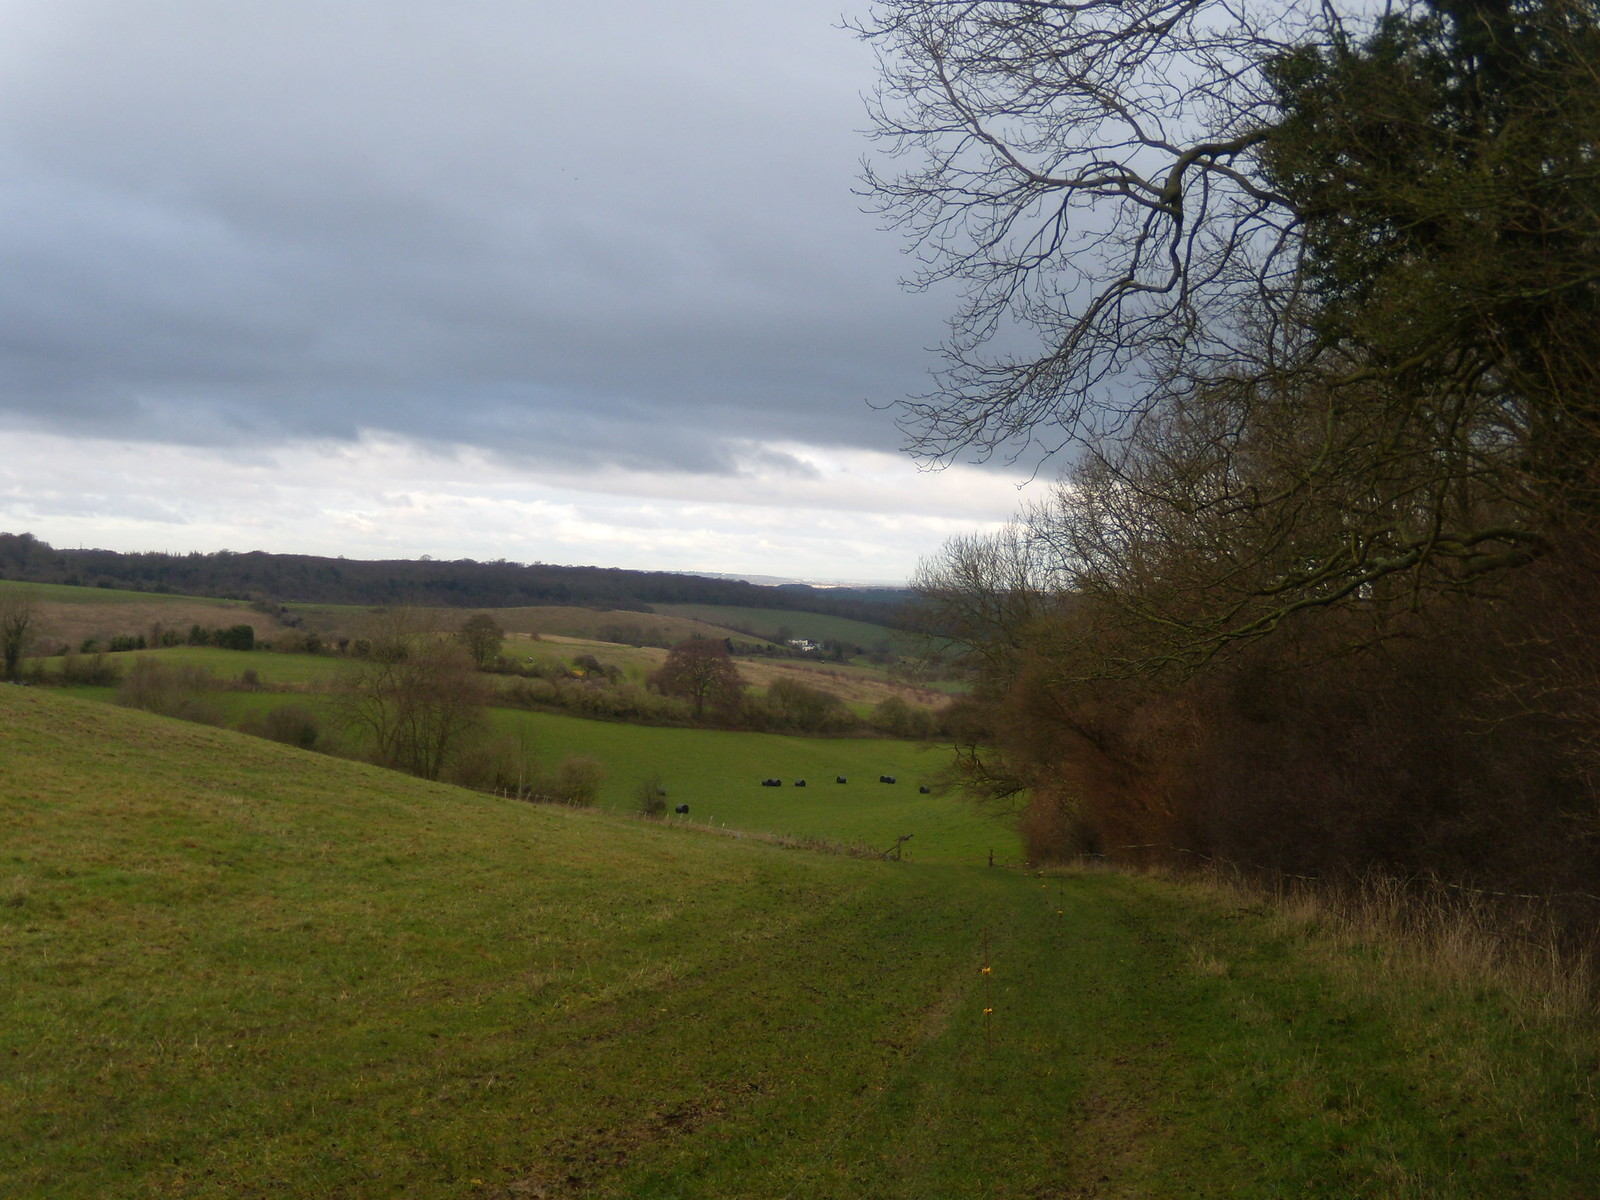 View Eynsford to Shoreham